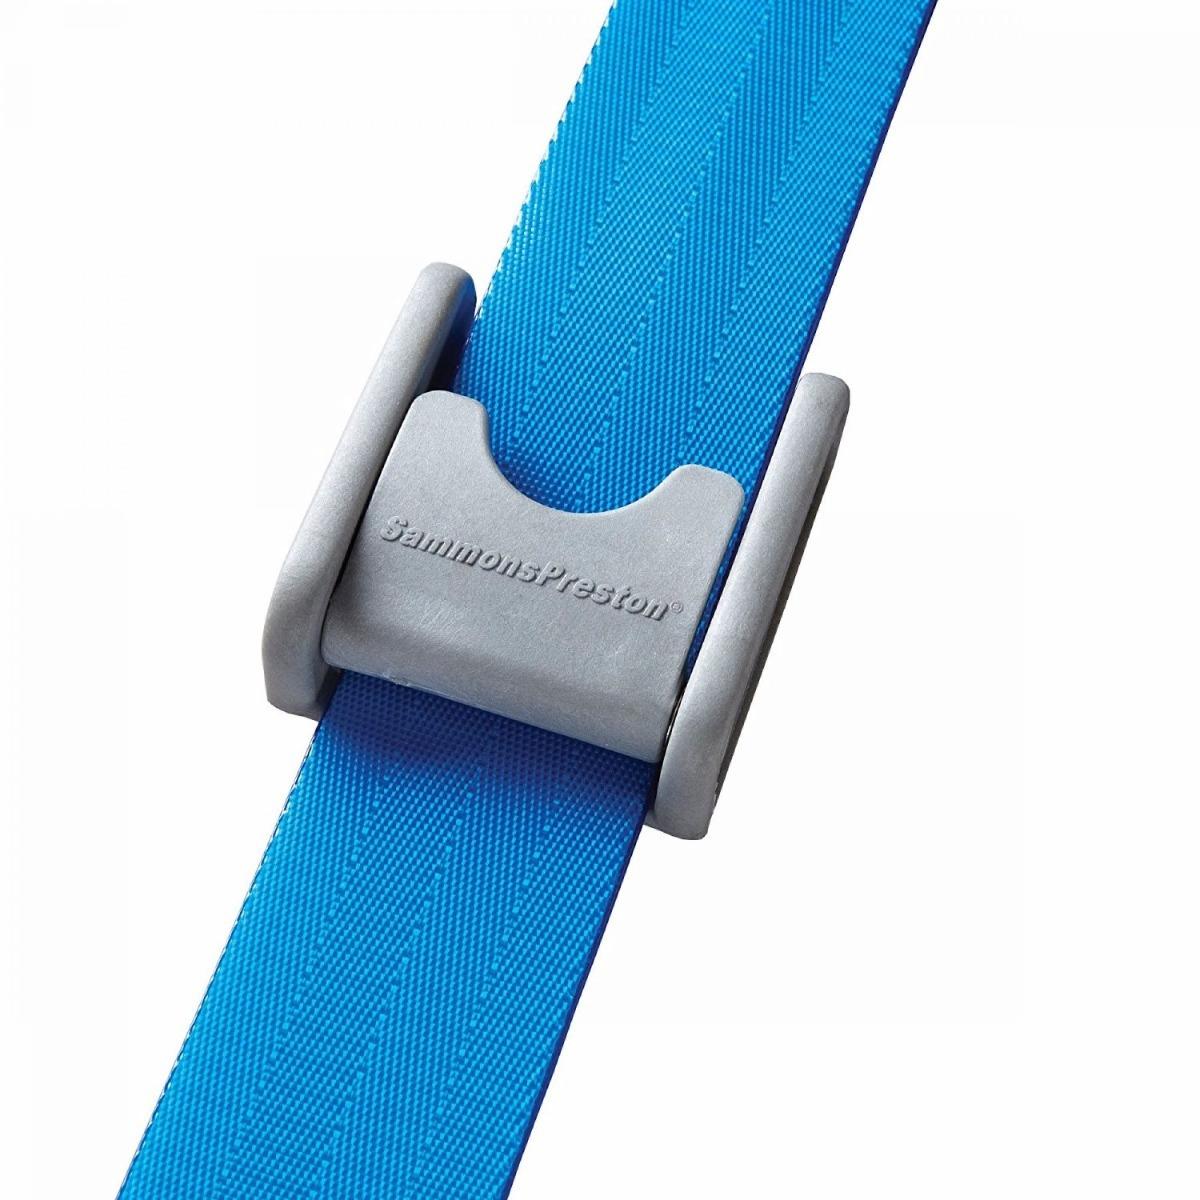 "Sammons Preston Quick Clean Gait Belts, Blue, 60""L, Plastic Buckle"